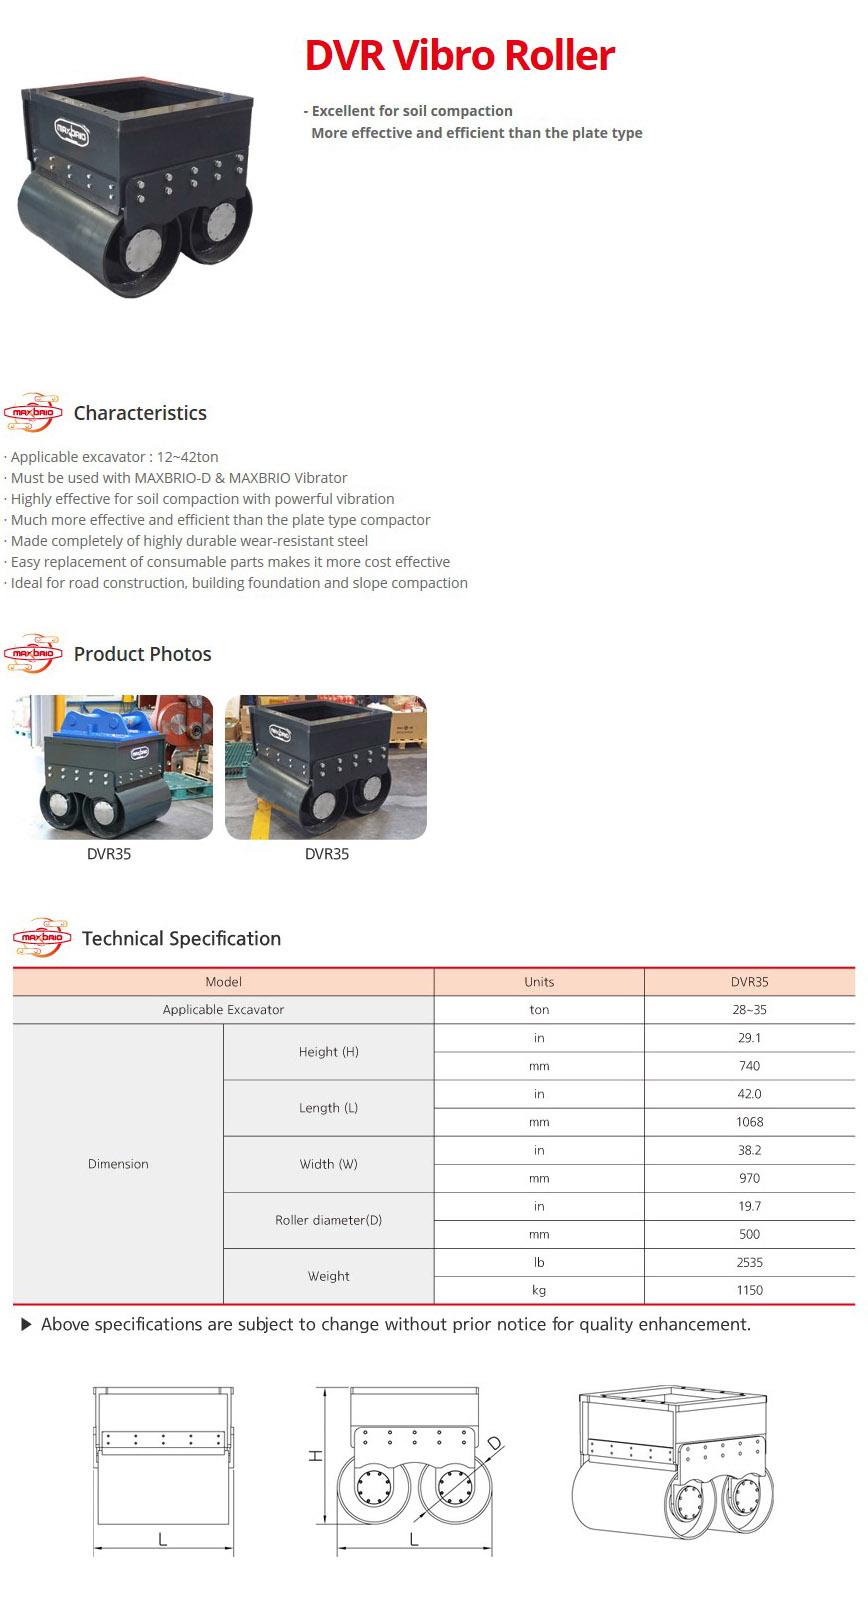 DAEDONG ENGINEERING DVR Vibro Roller